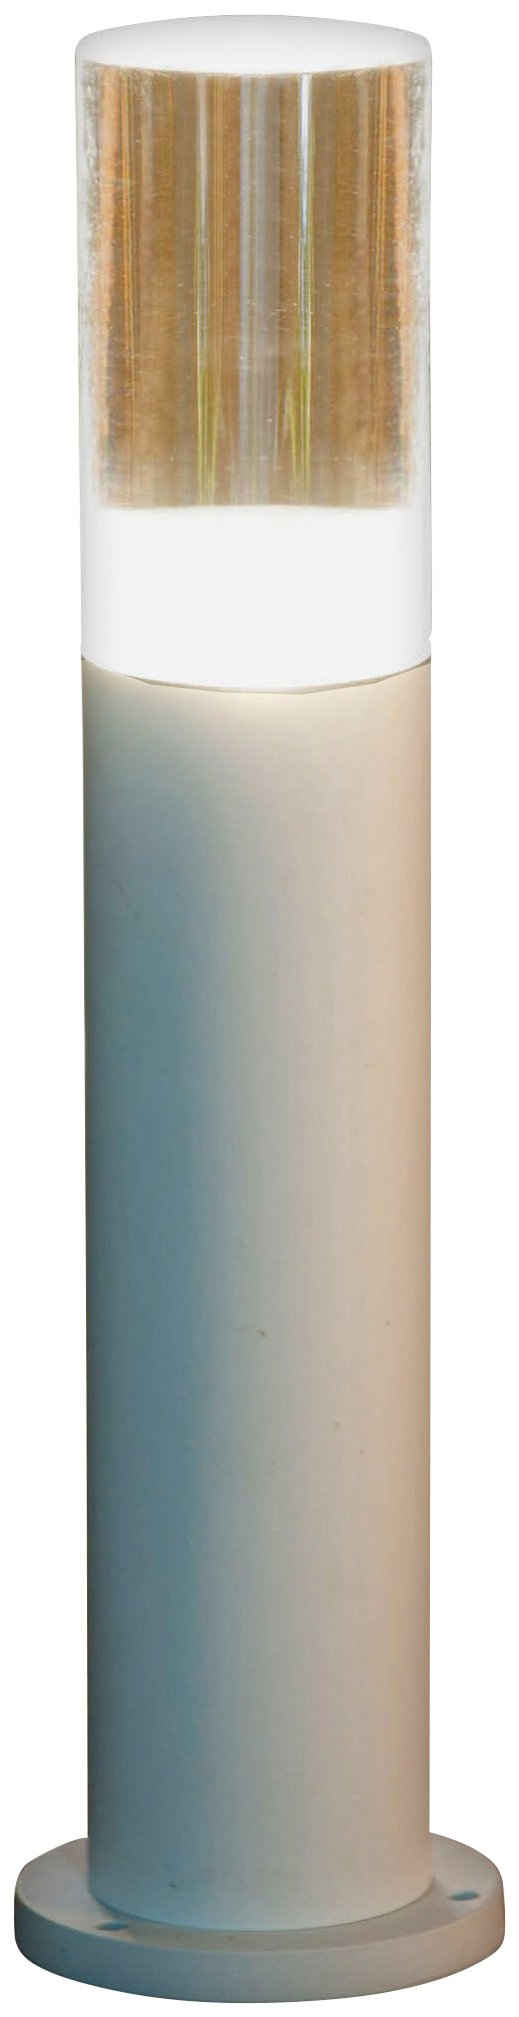 Heissner Teichleuchte »Smart Lights L473-00«